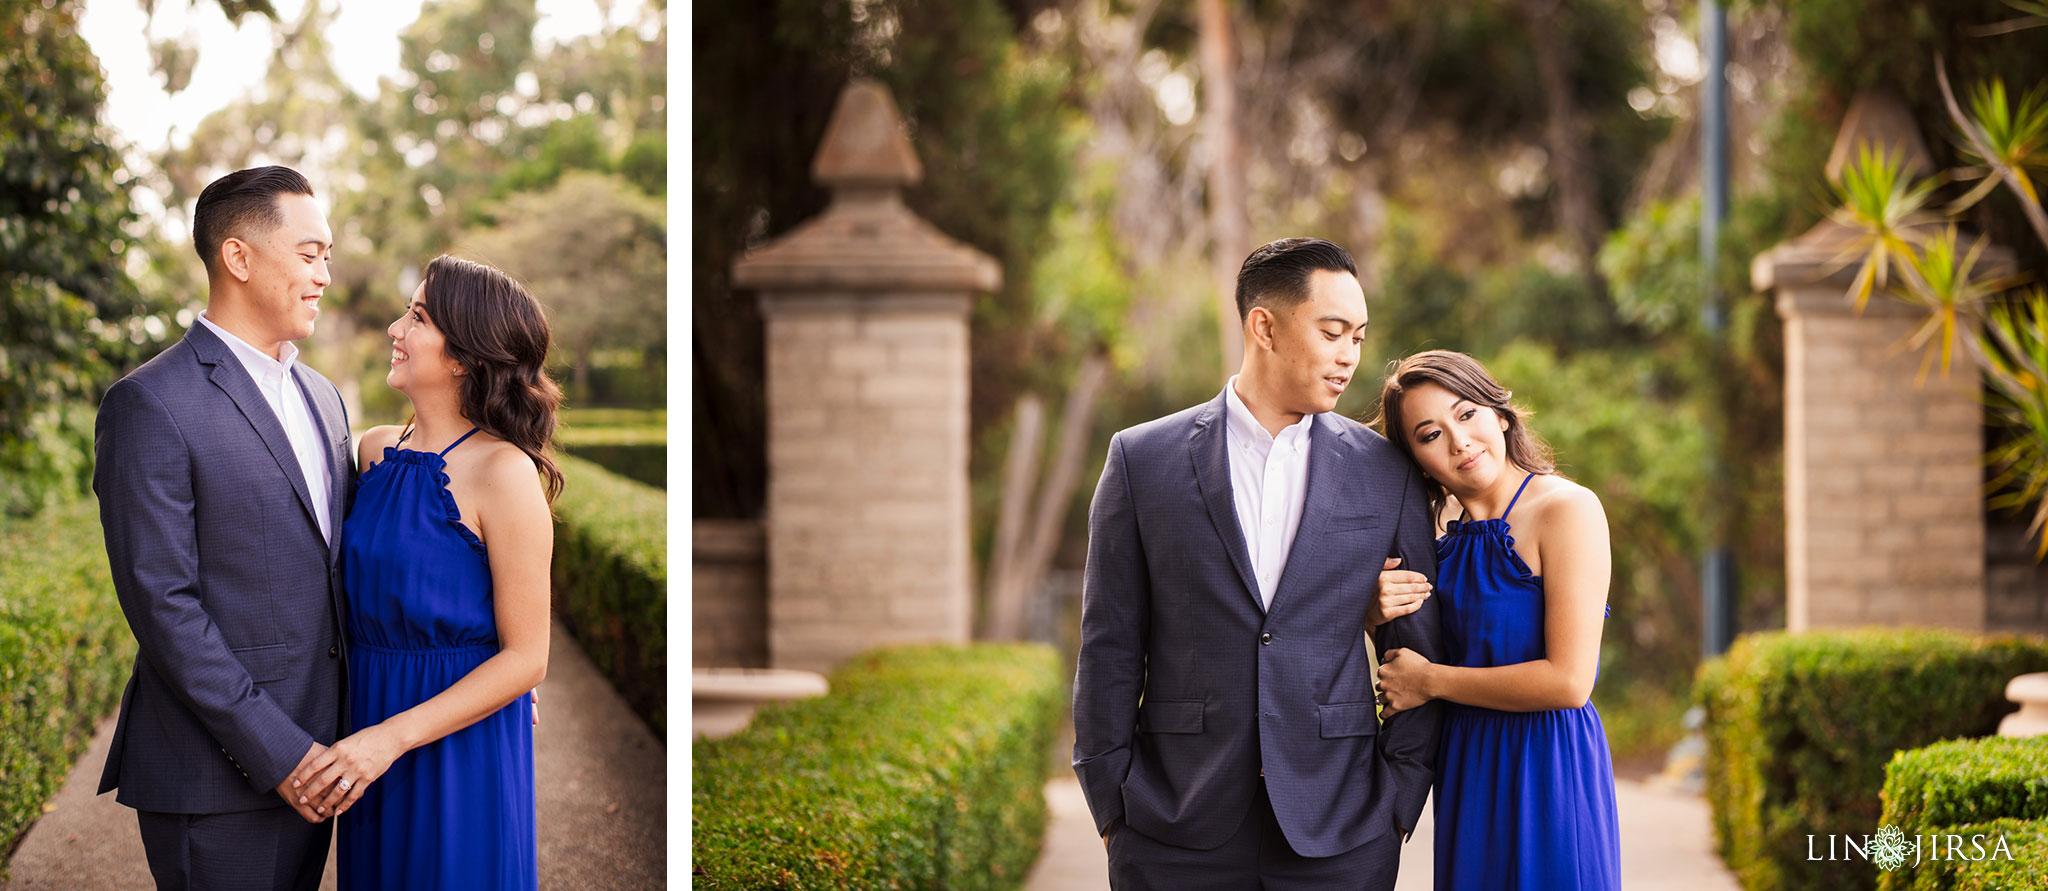 02 balboa park san diego engagement photography